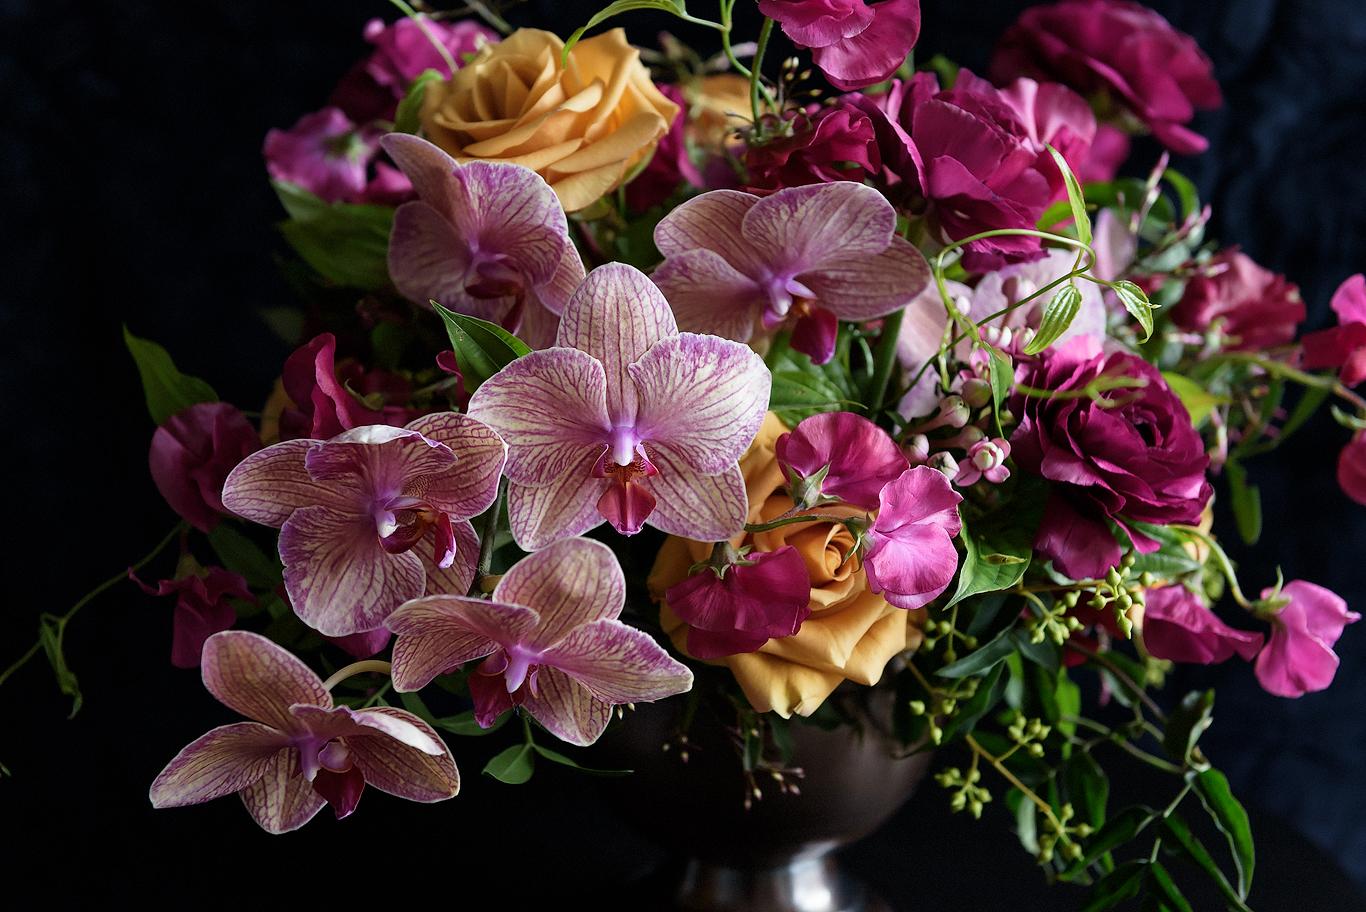 Orchids_008.jpg